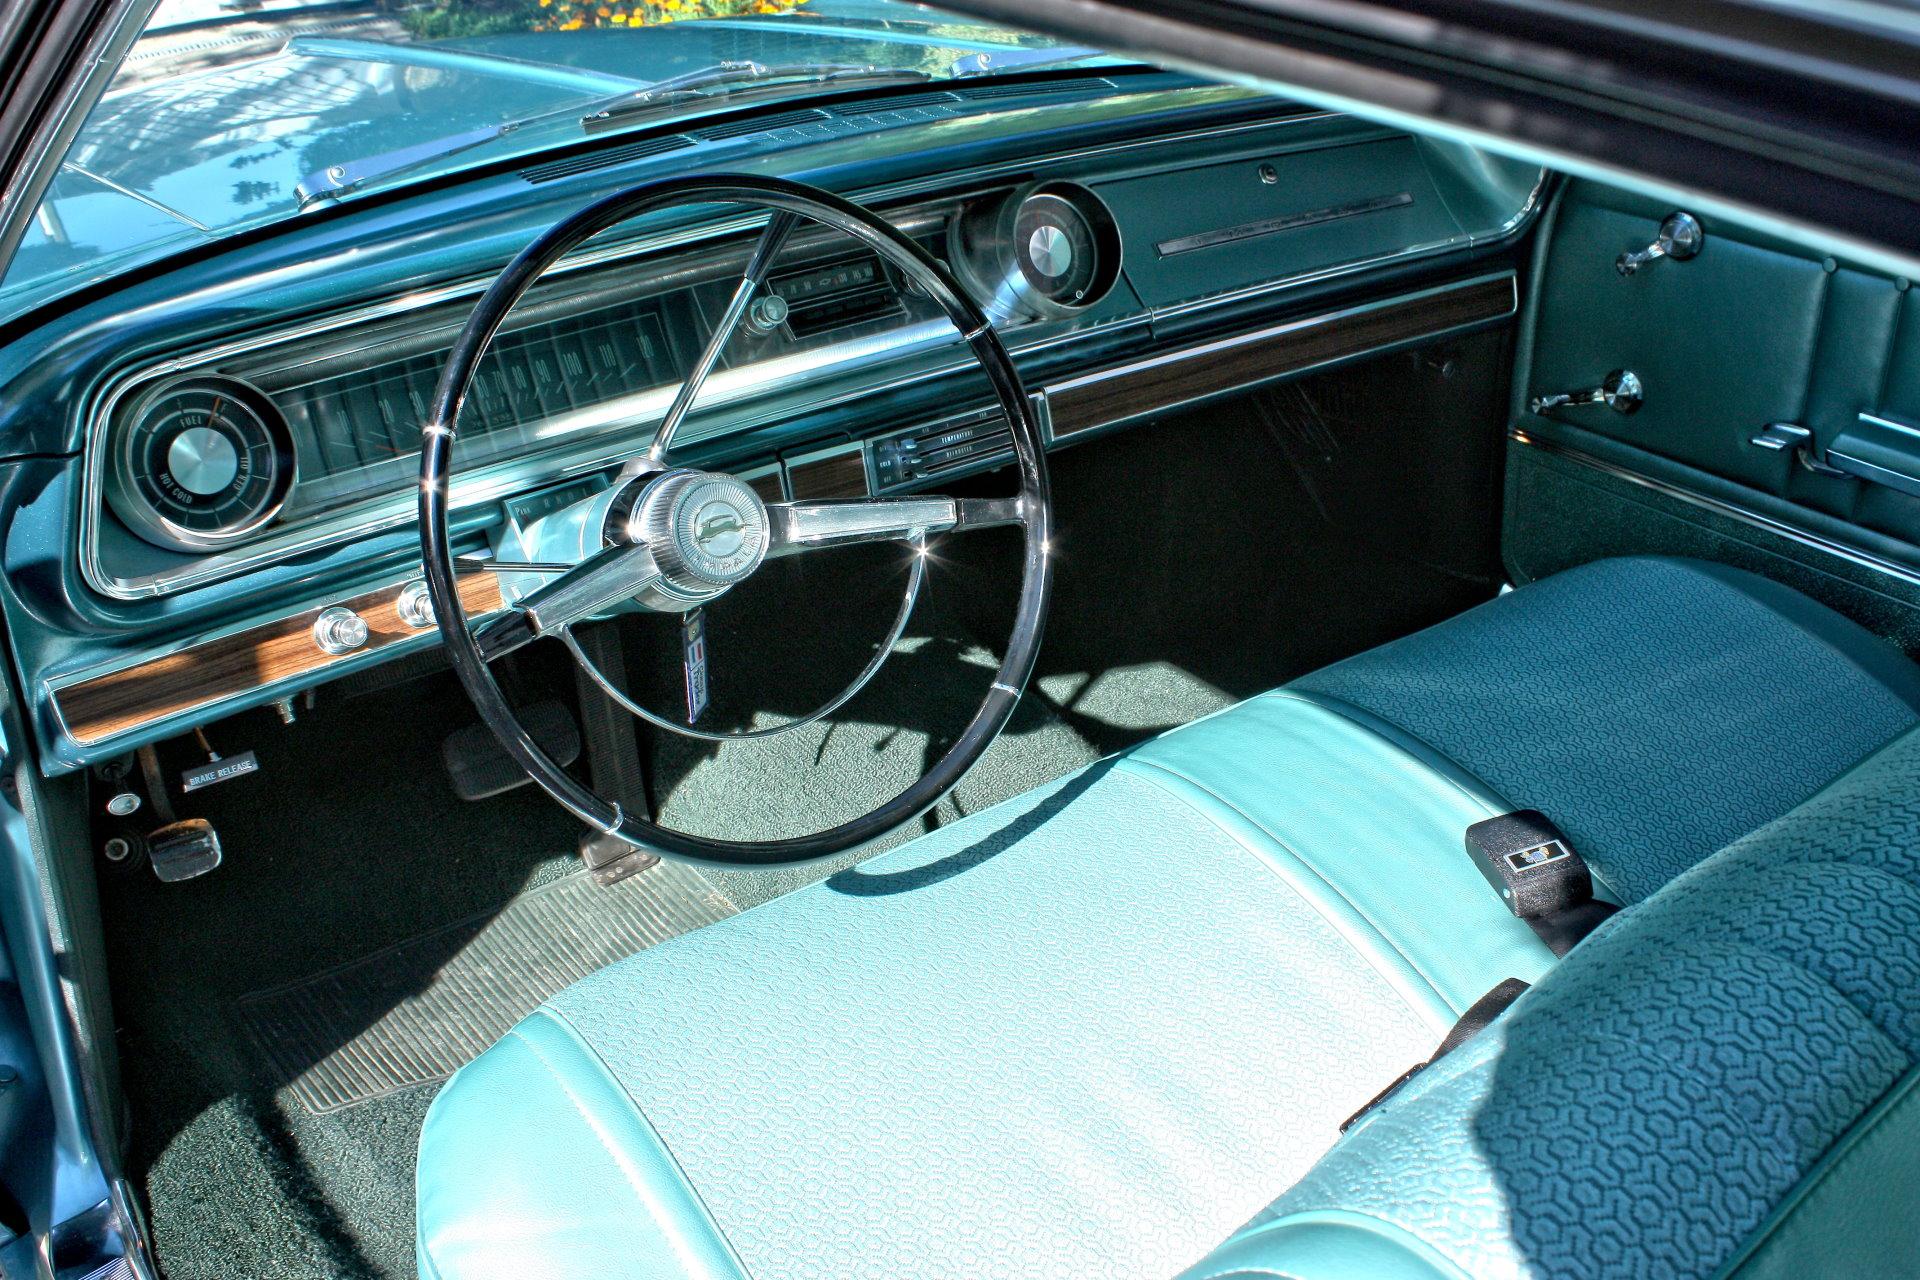 chevrolet impala 1967 mieten auto bild idee. Black Bedroom Furniture Sets. Home Design Ideas